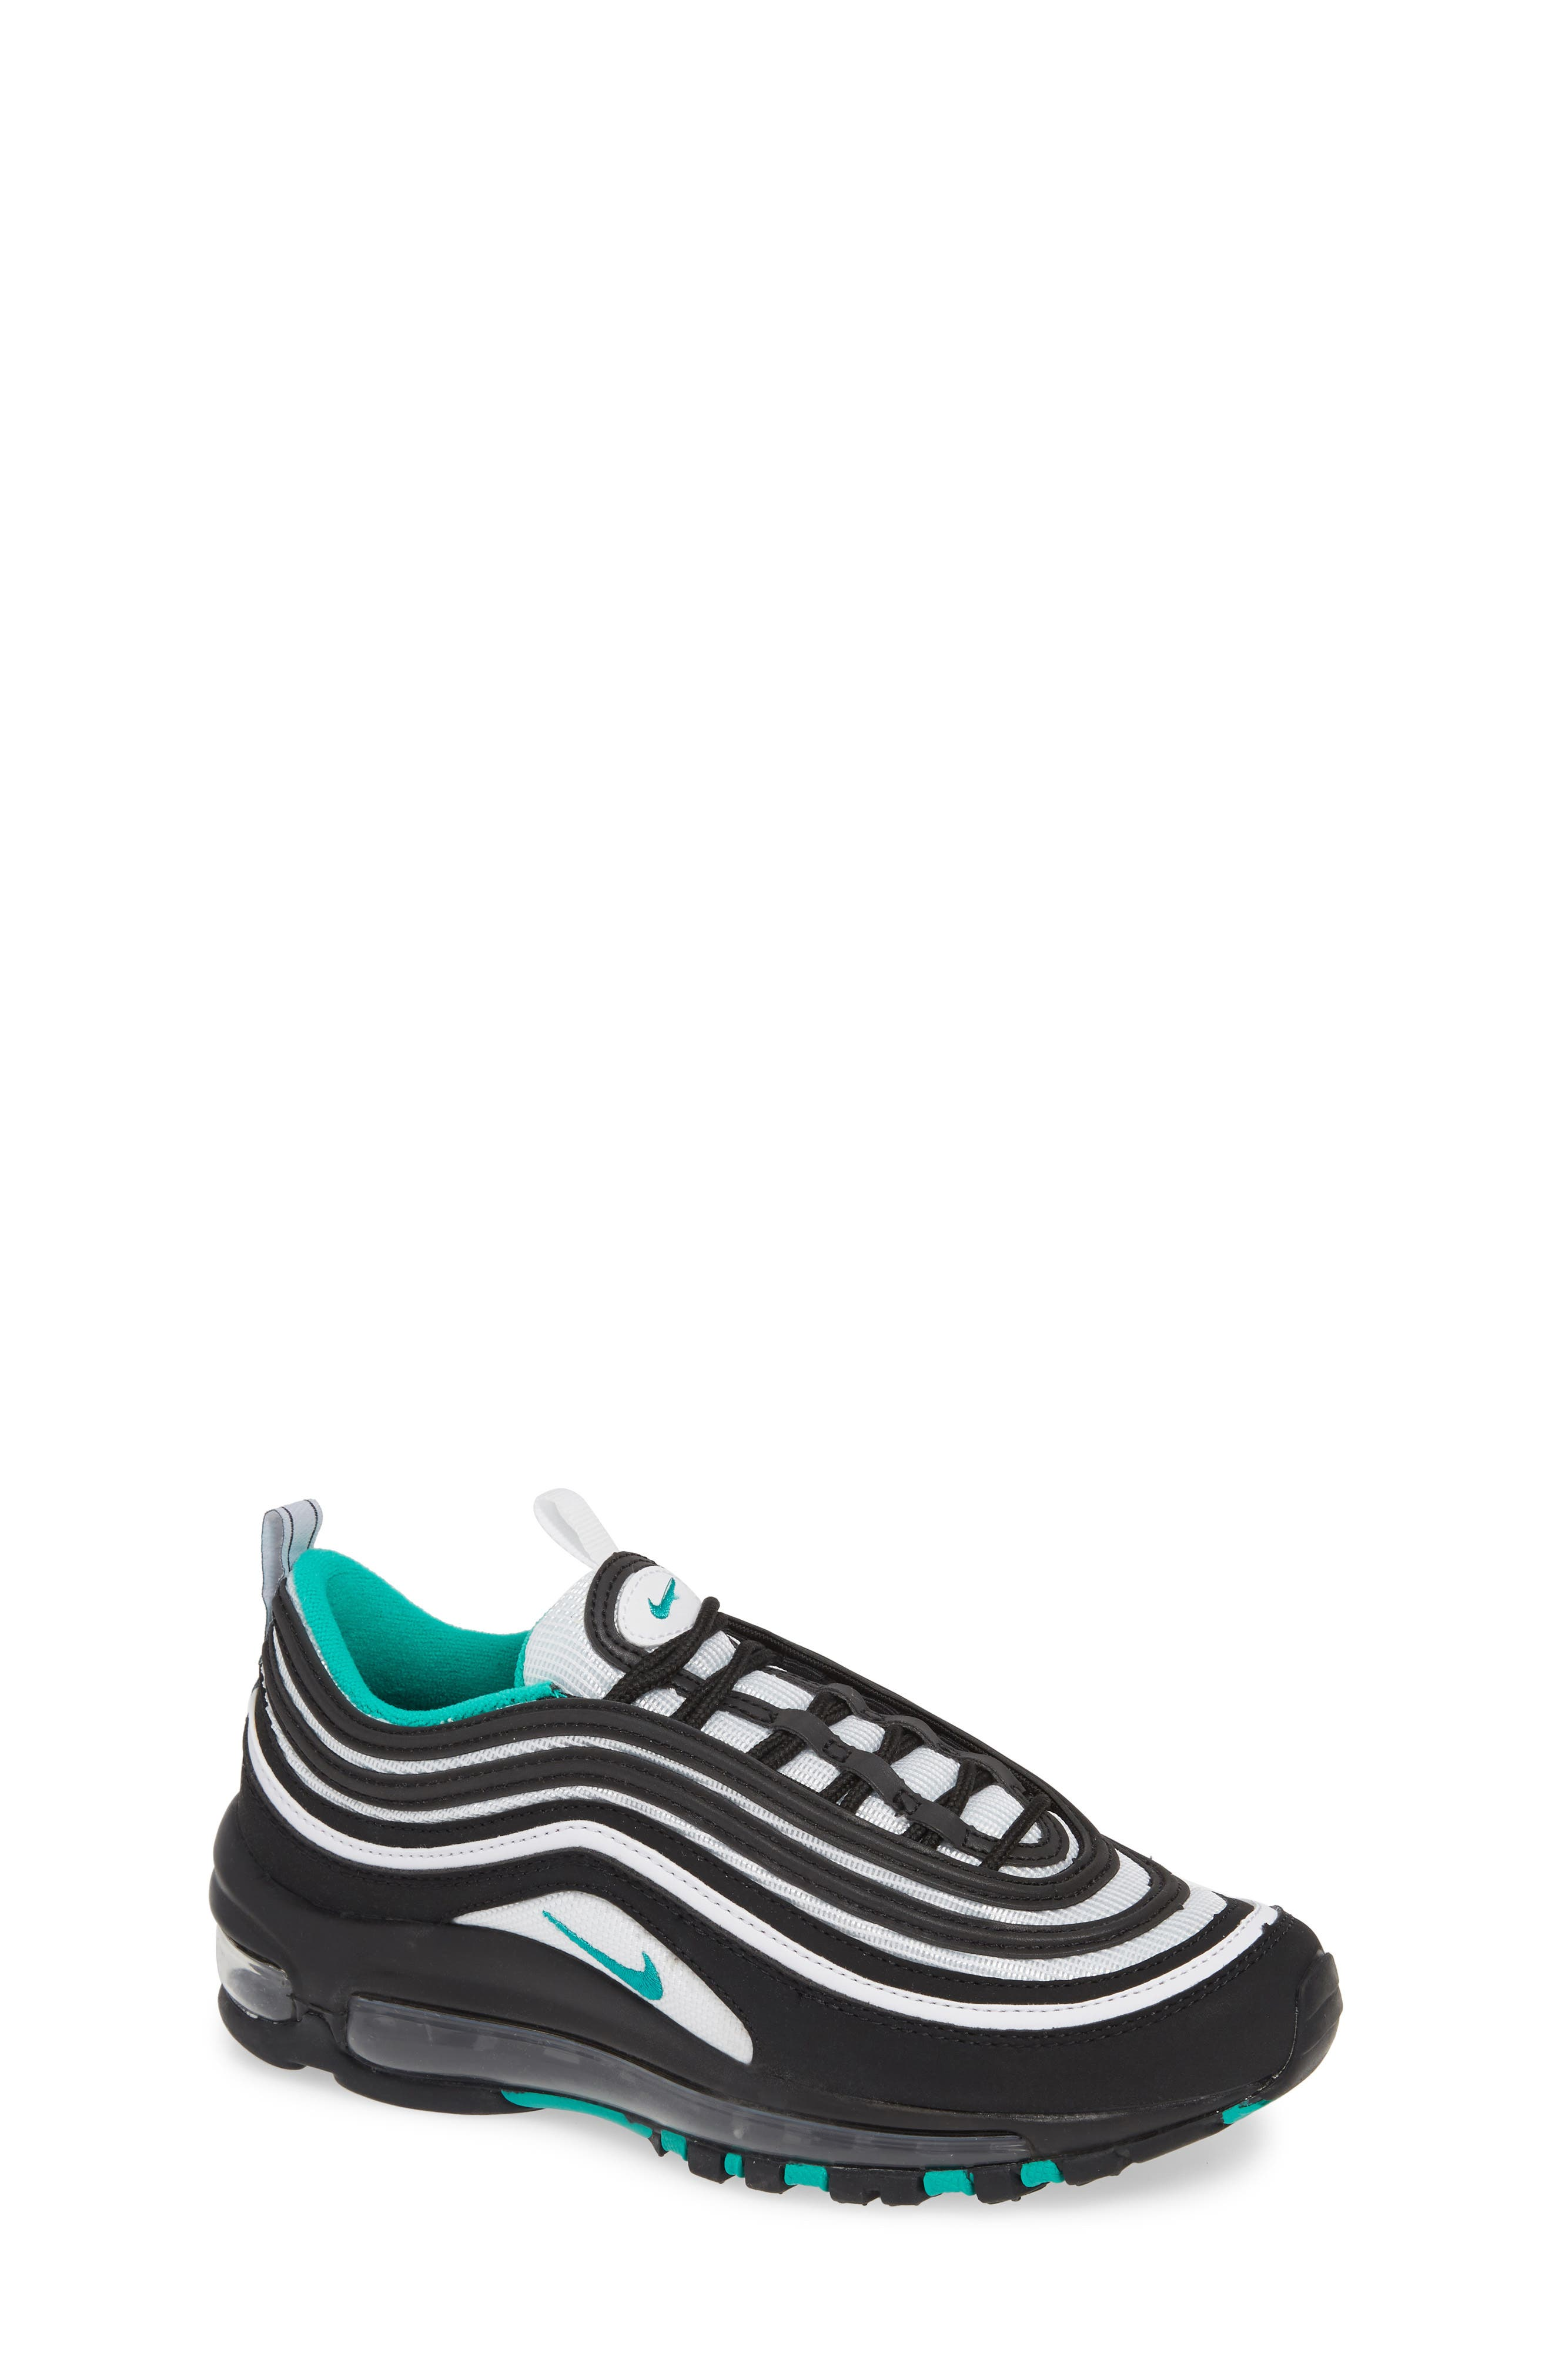 NIKE, Air Max 97 Sneaker, Main thumbnail 1, color, BLACK/ CLEAR EMERALD-WHITE